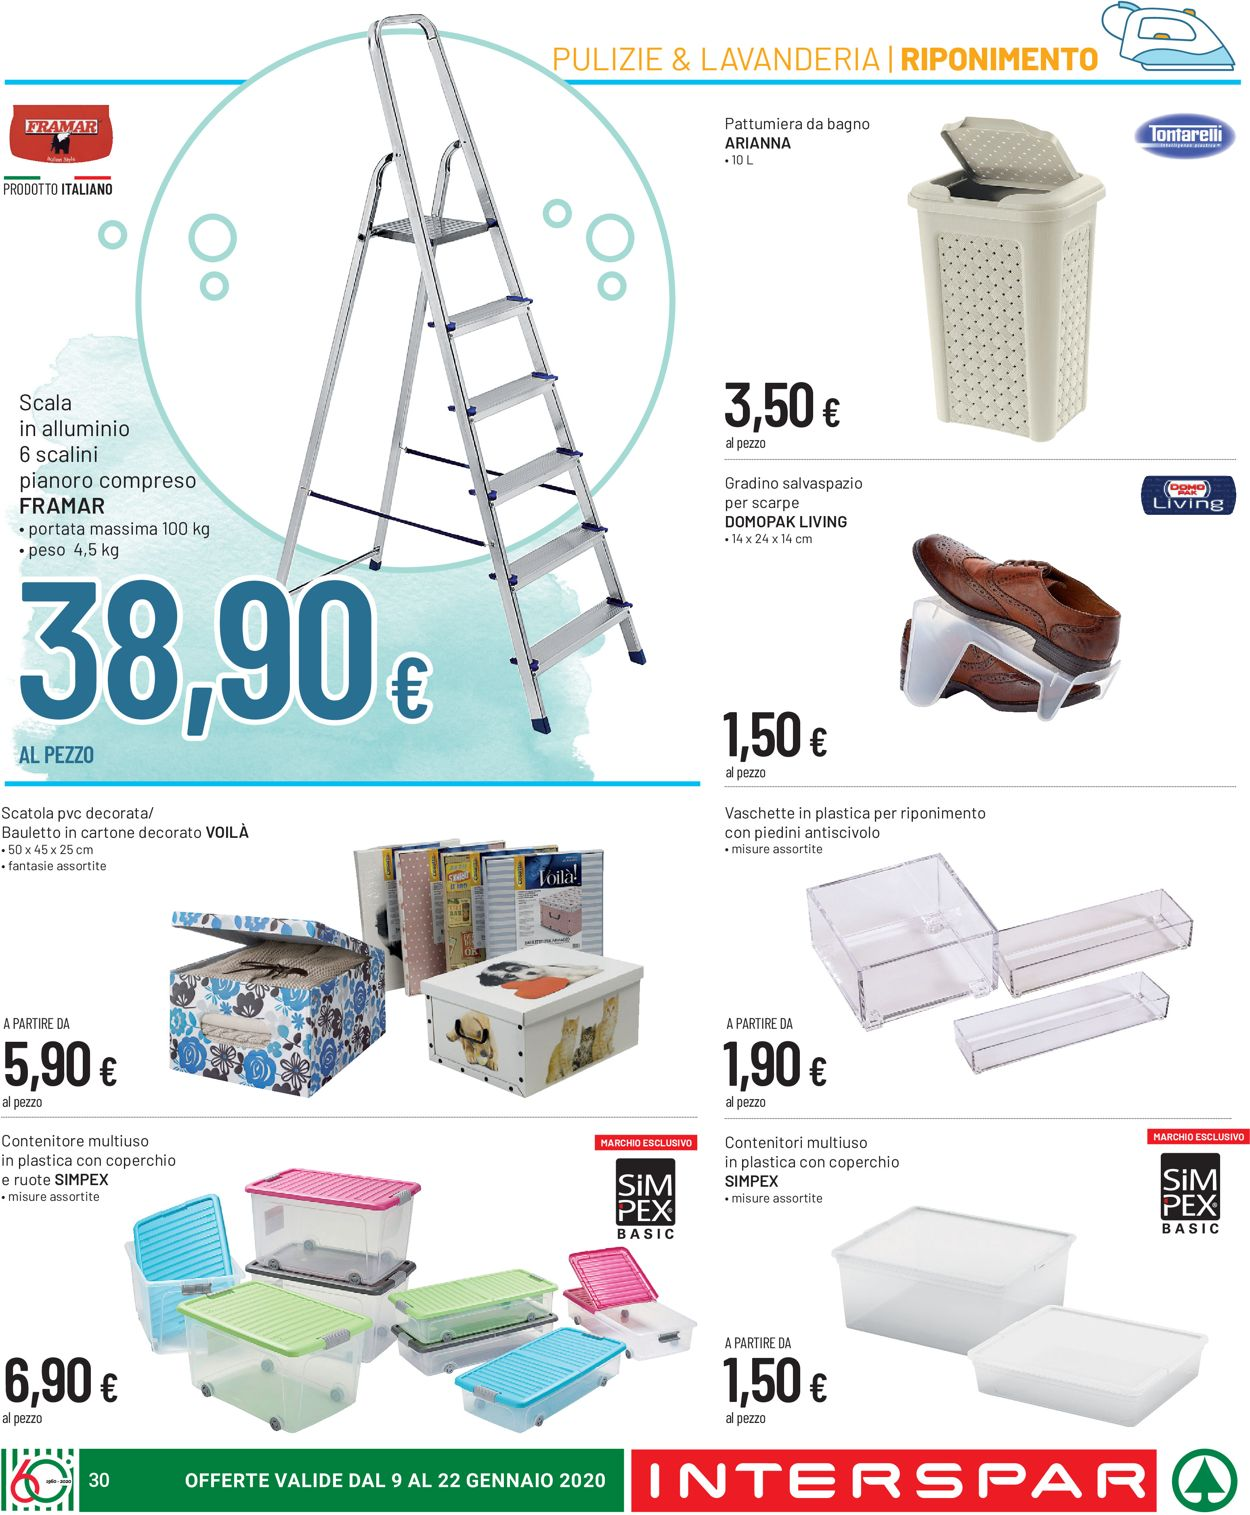 Volantino Interspar - Offerte 09/01-22/01/2020 (Pagina 30)